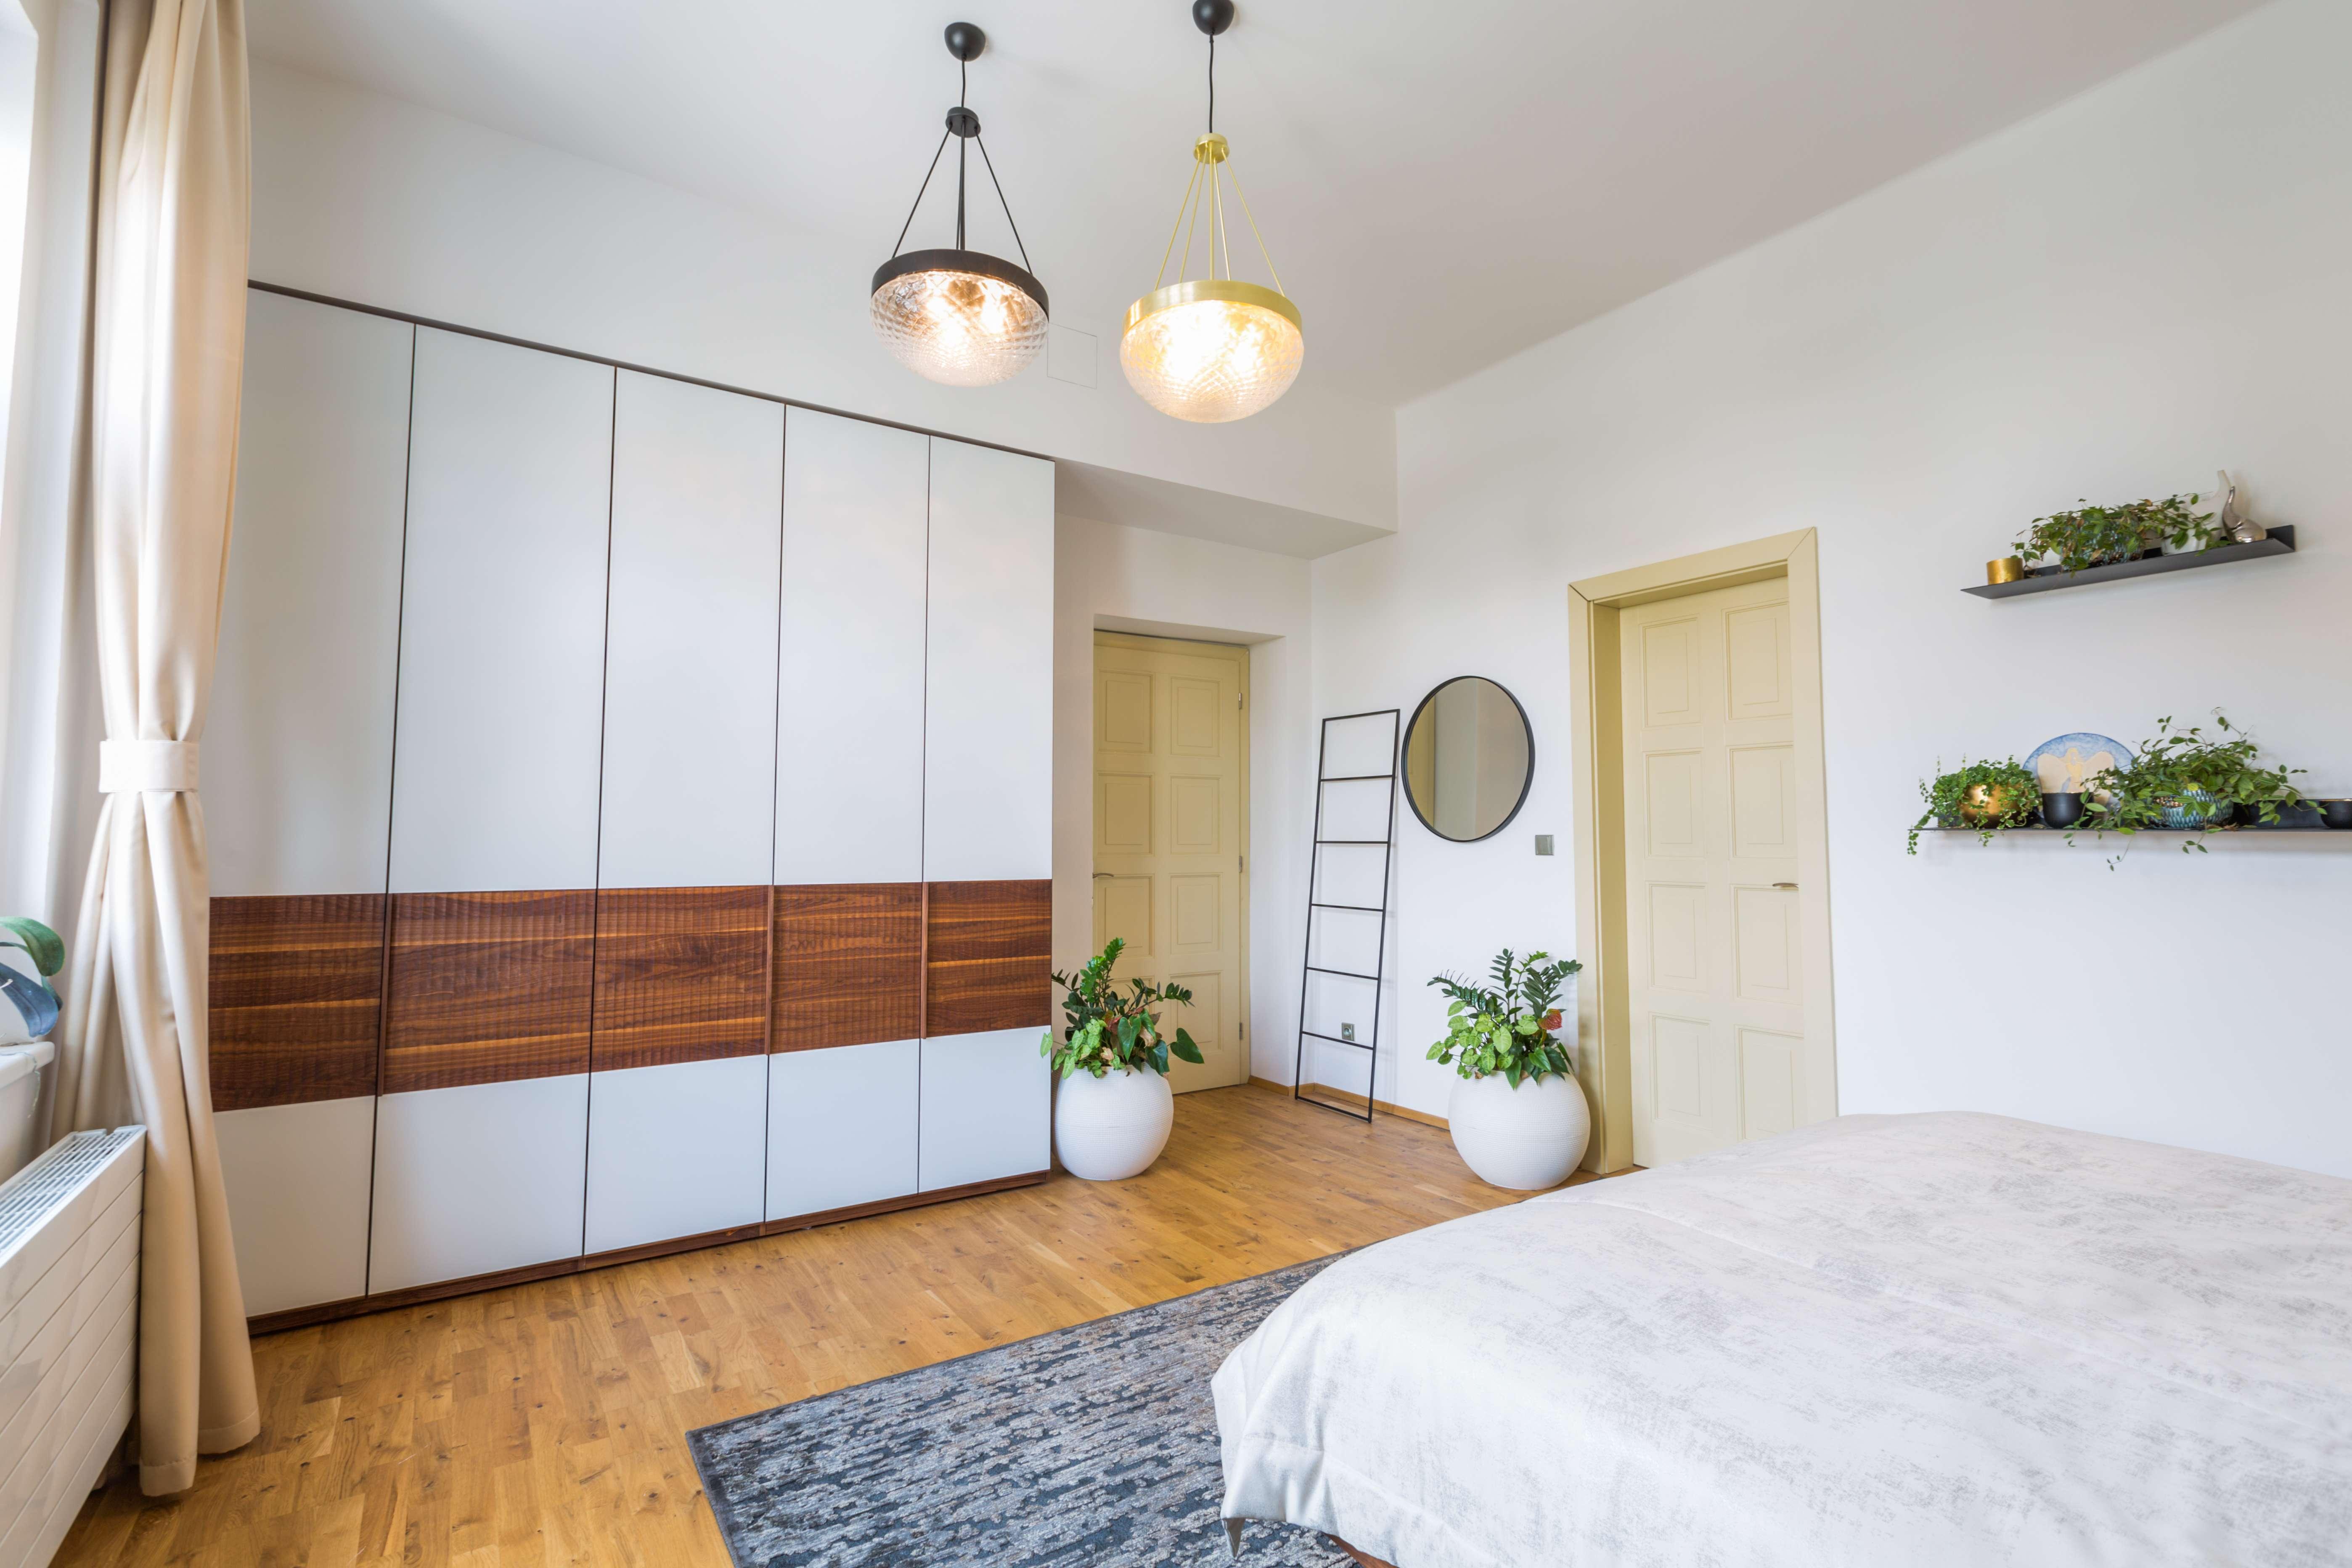 Luxusní ložnice Team 7 | DECOLAND